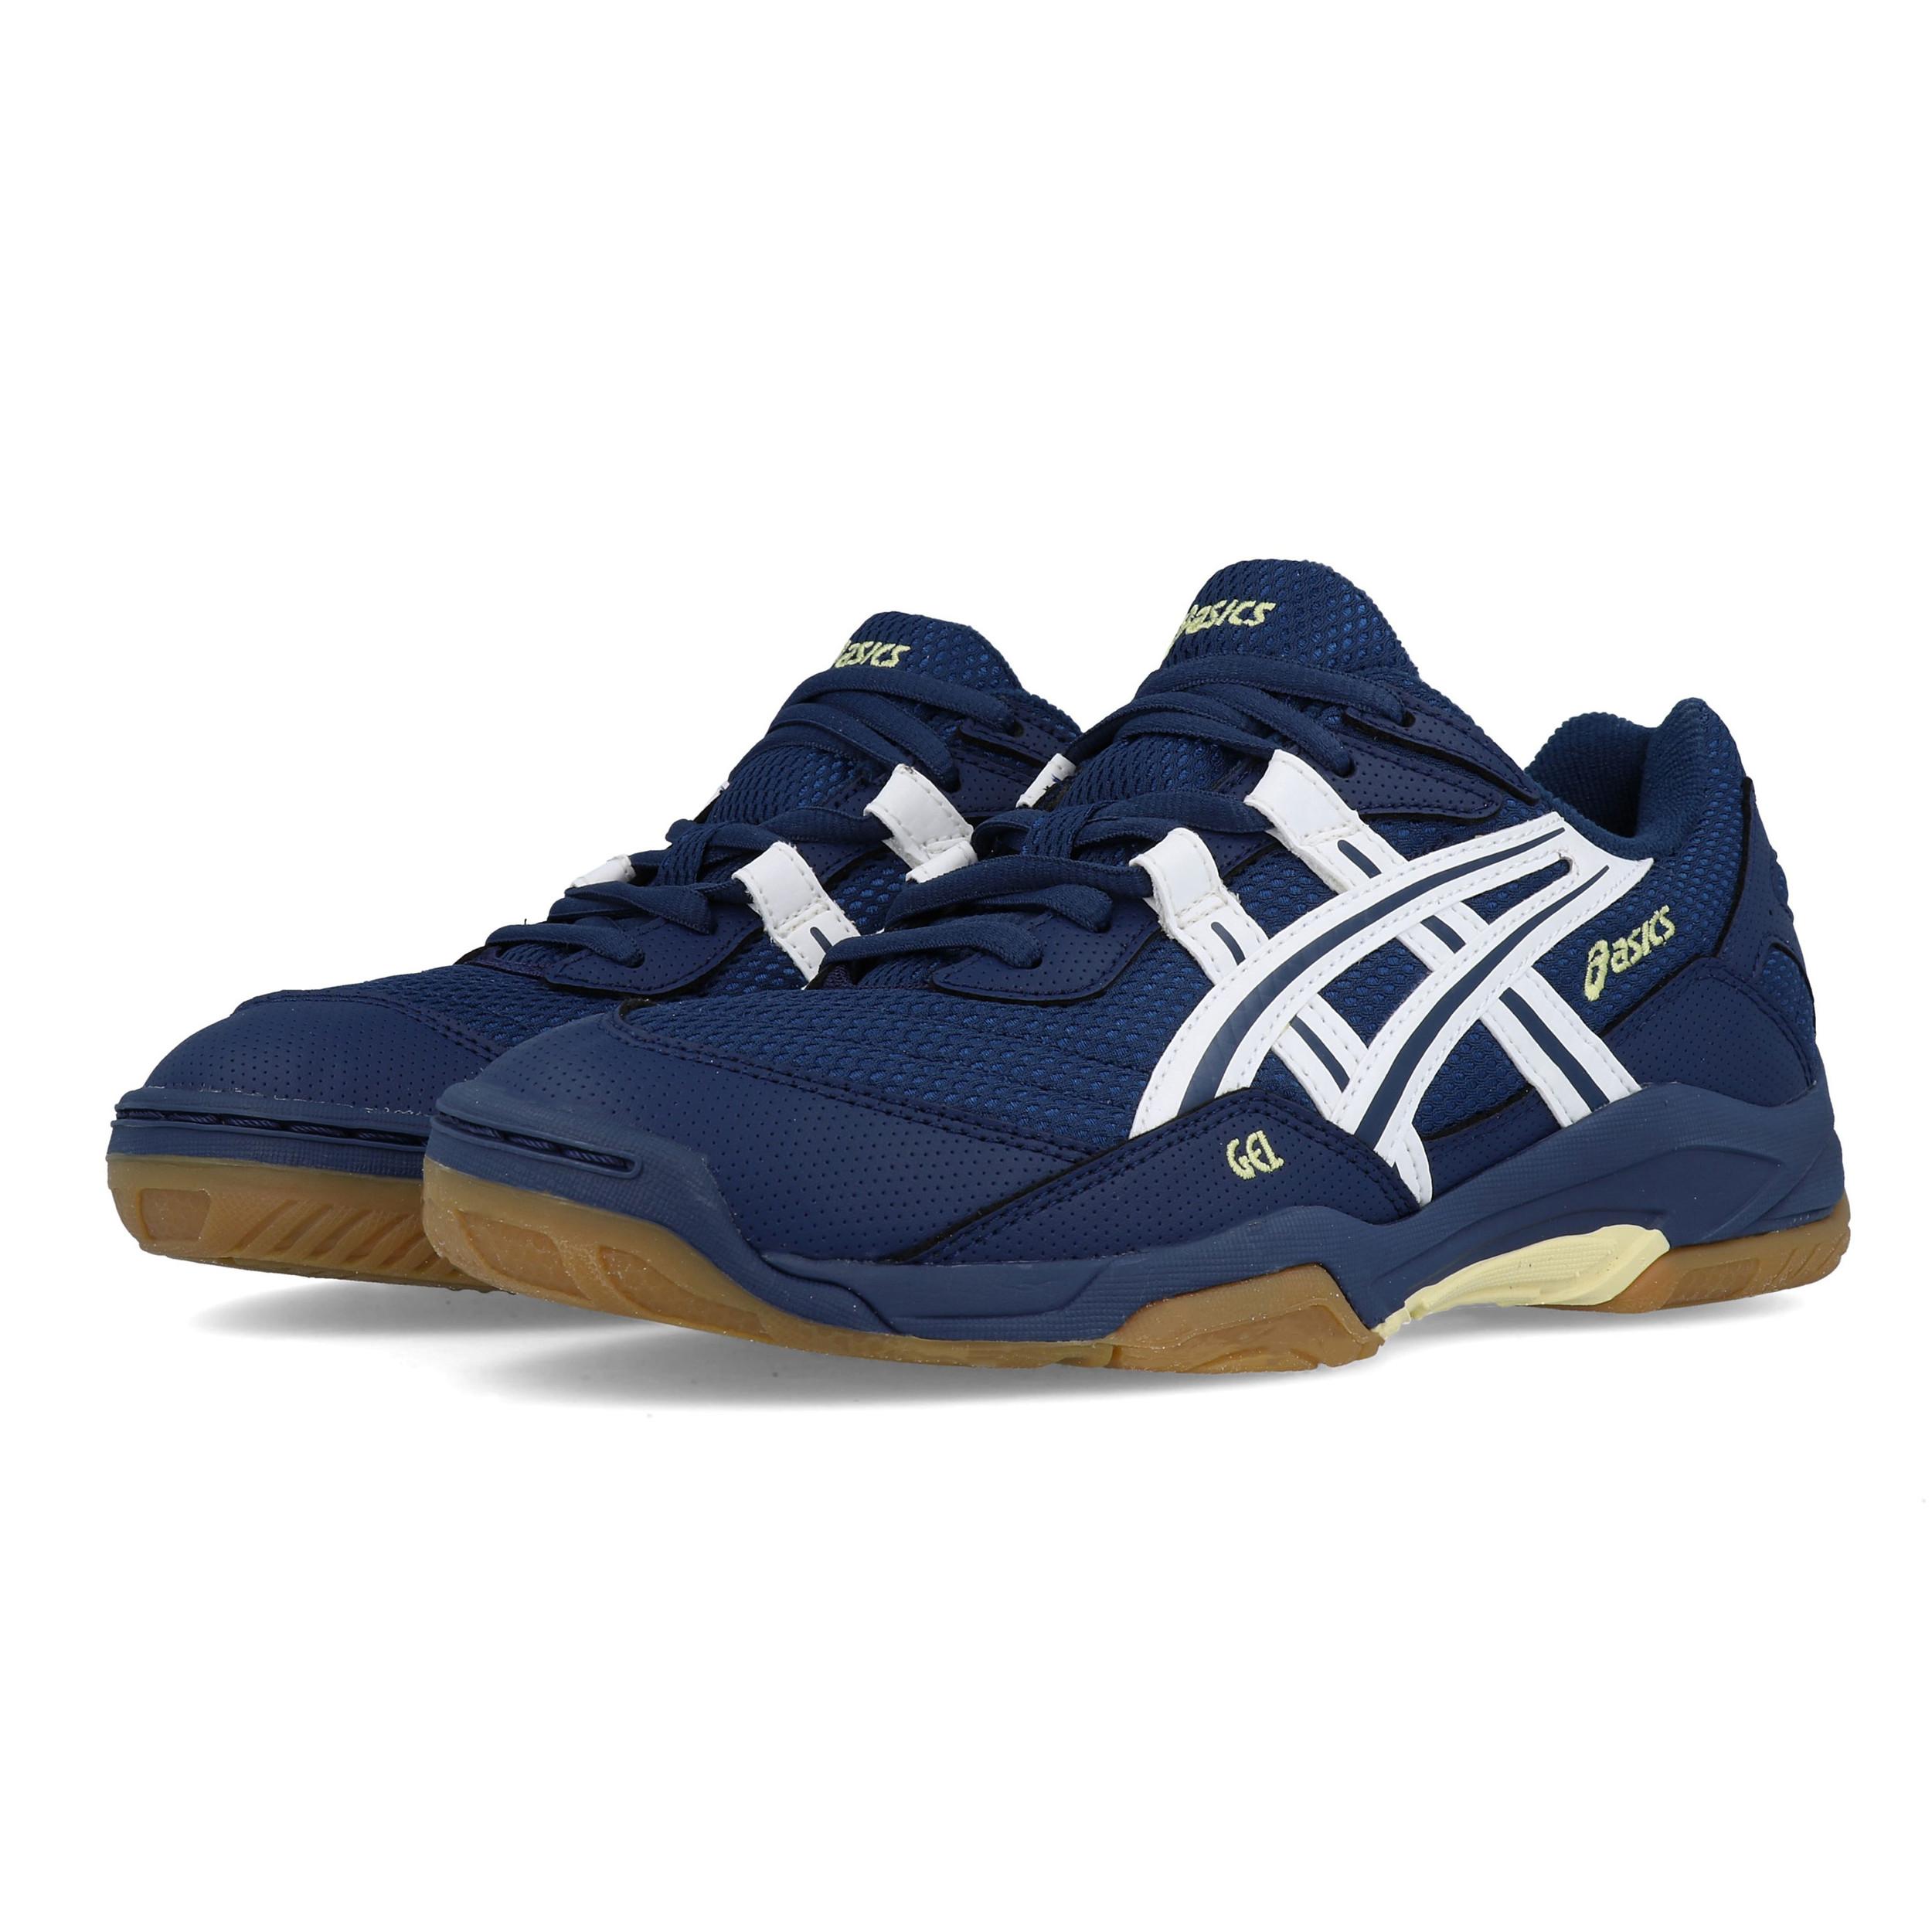 Asics Gel Hunter 2 Badminton Shoes Men